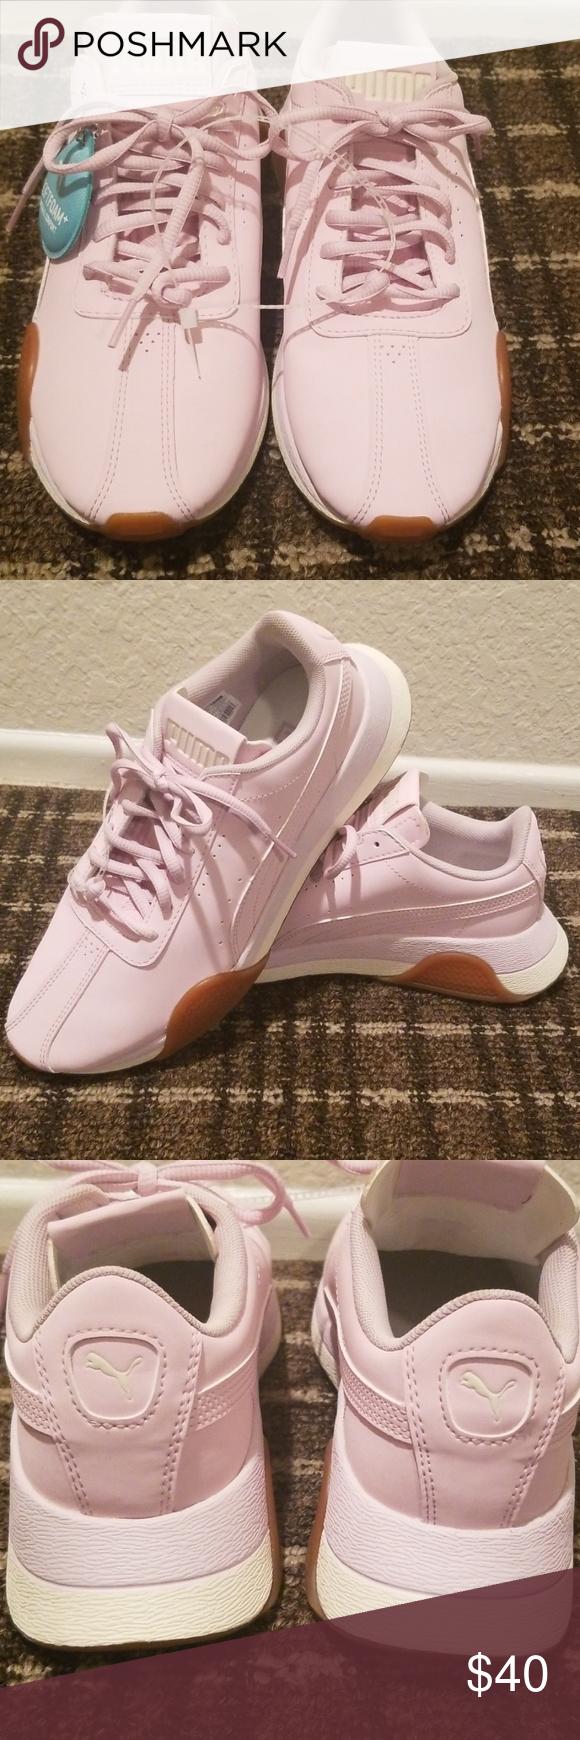 Puma Pink Soft foam Sneakers - NWOT